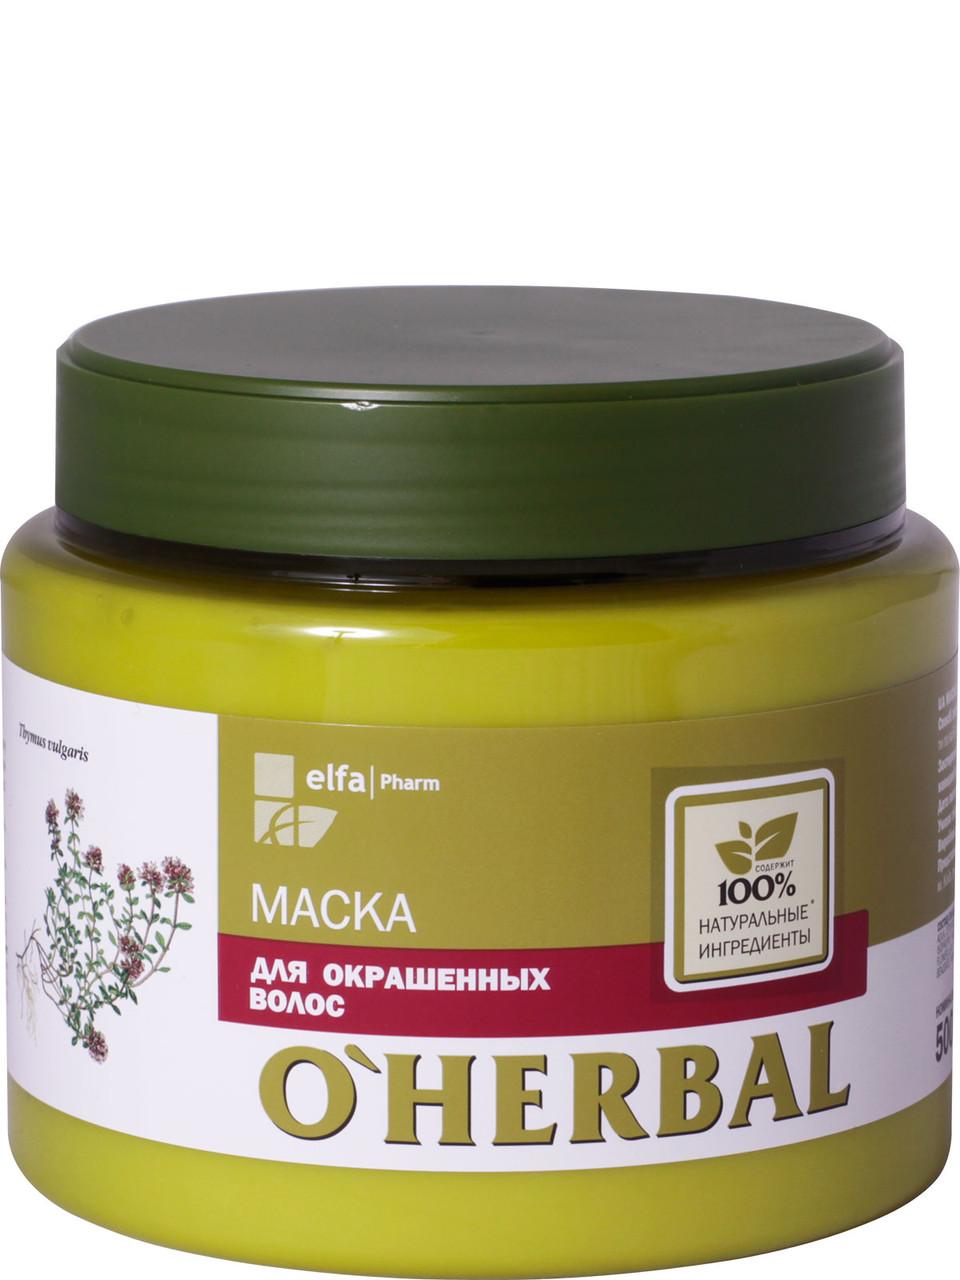 O'Herbal Маска для окрашенных волос 500мл